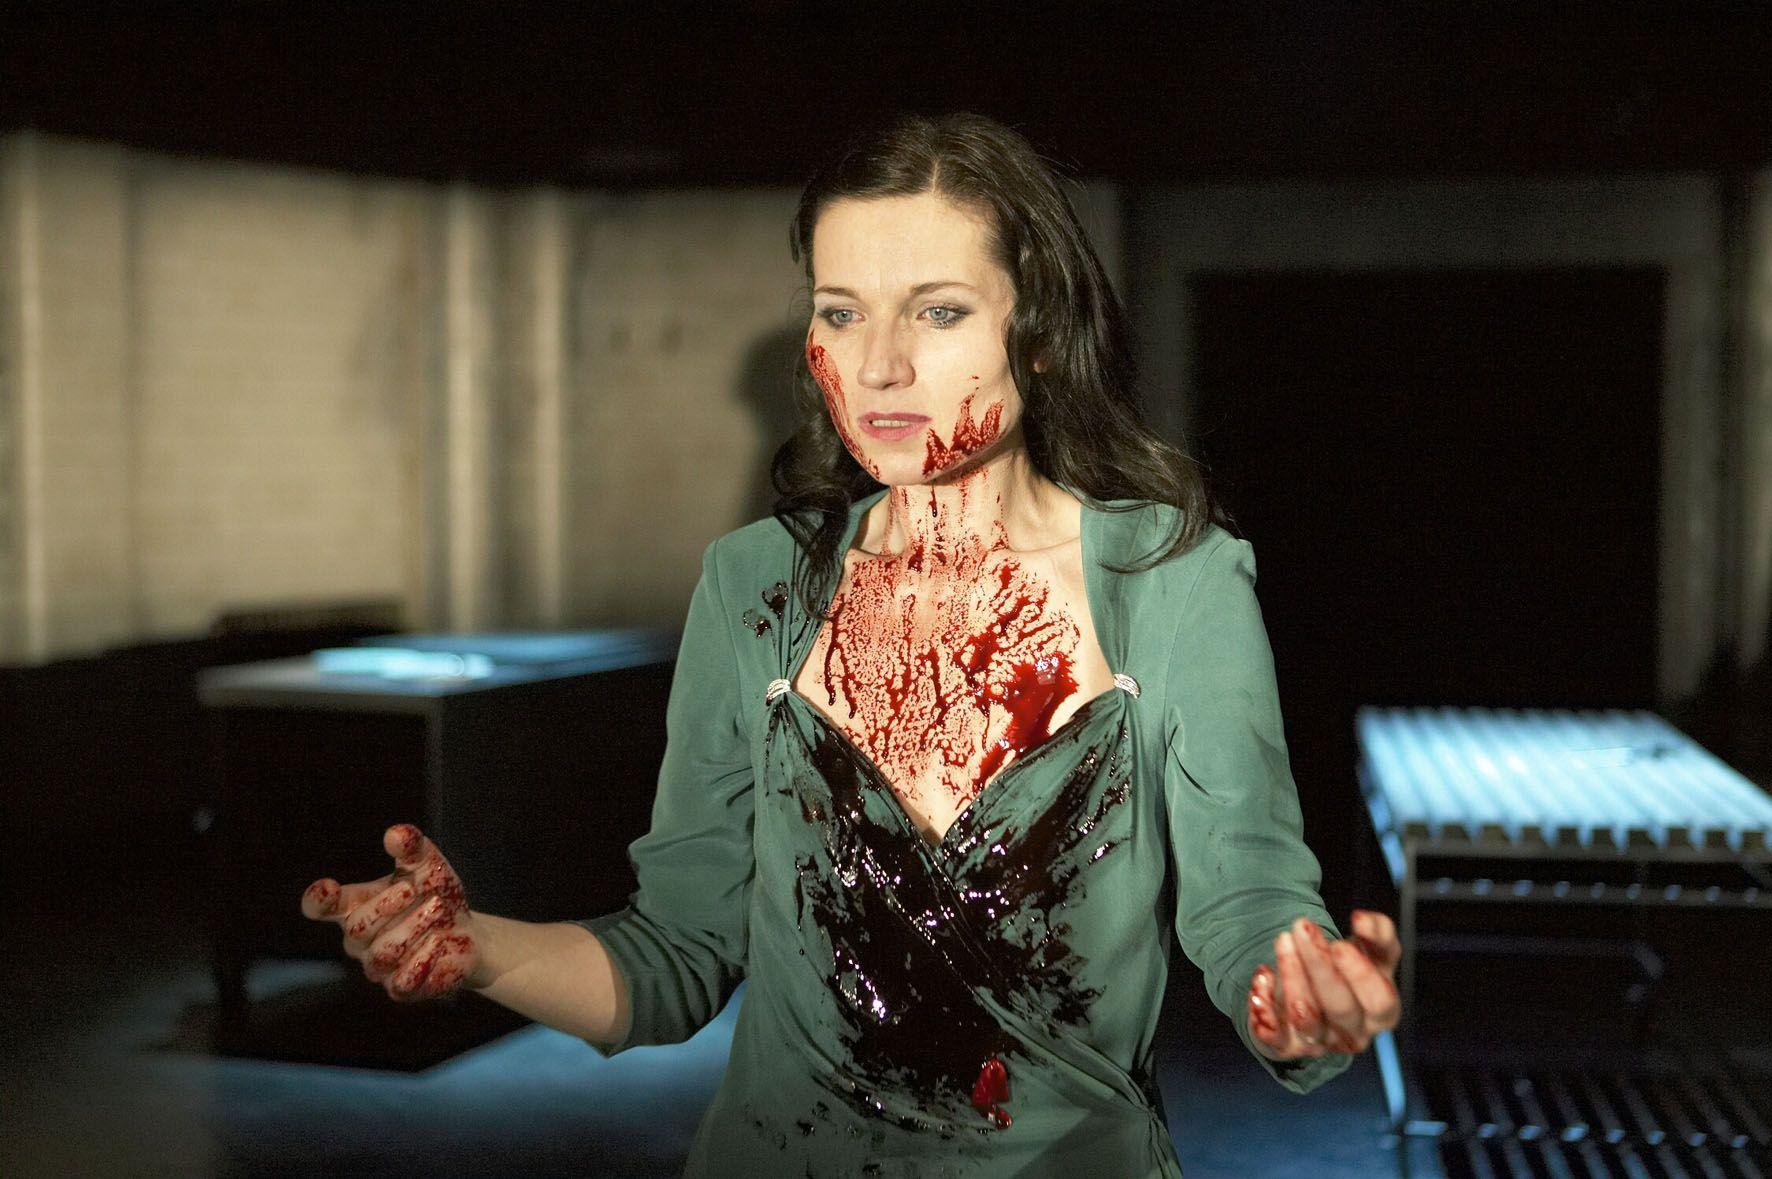 Did Macbeth murder/have anyone killed after his wife (Lady Macbeth) killed herself?